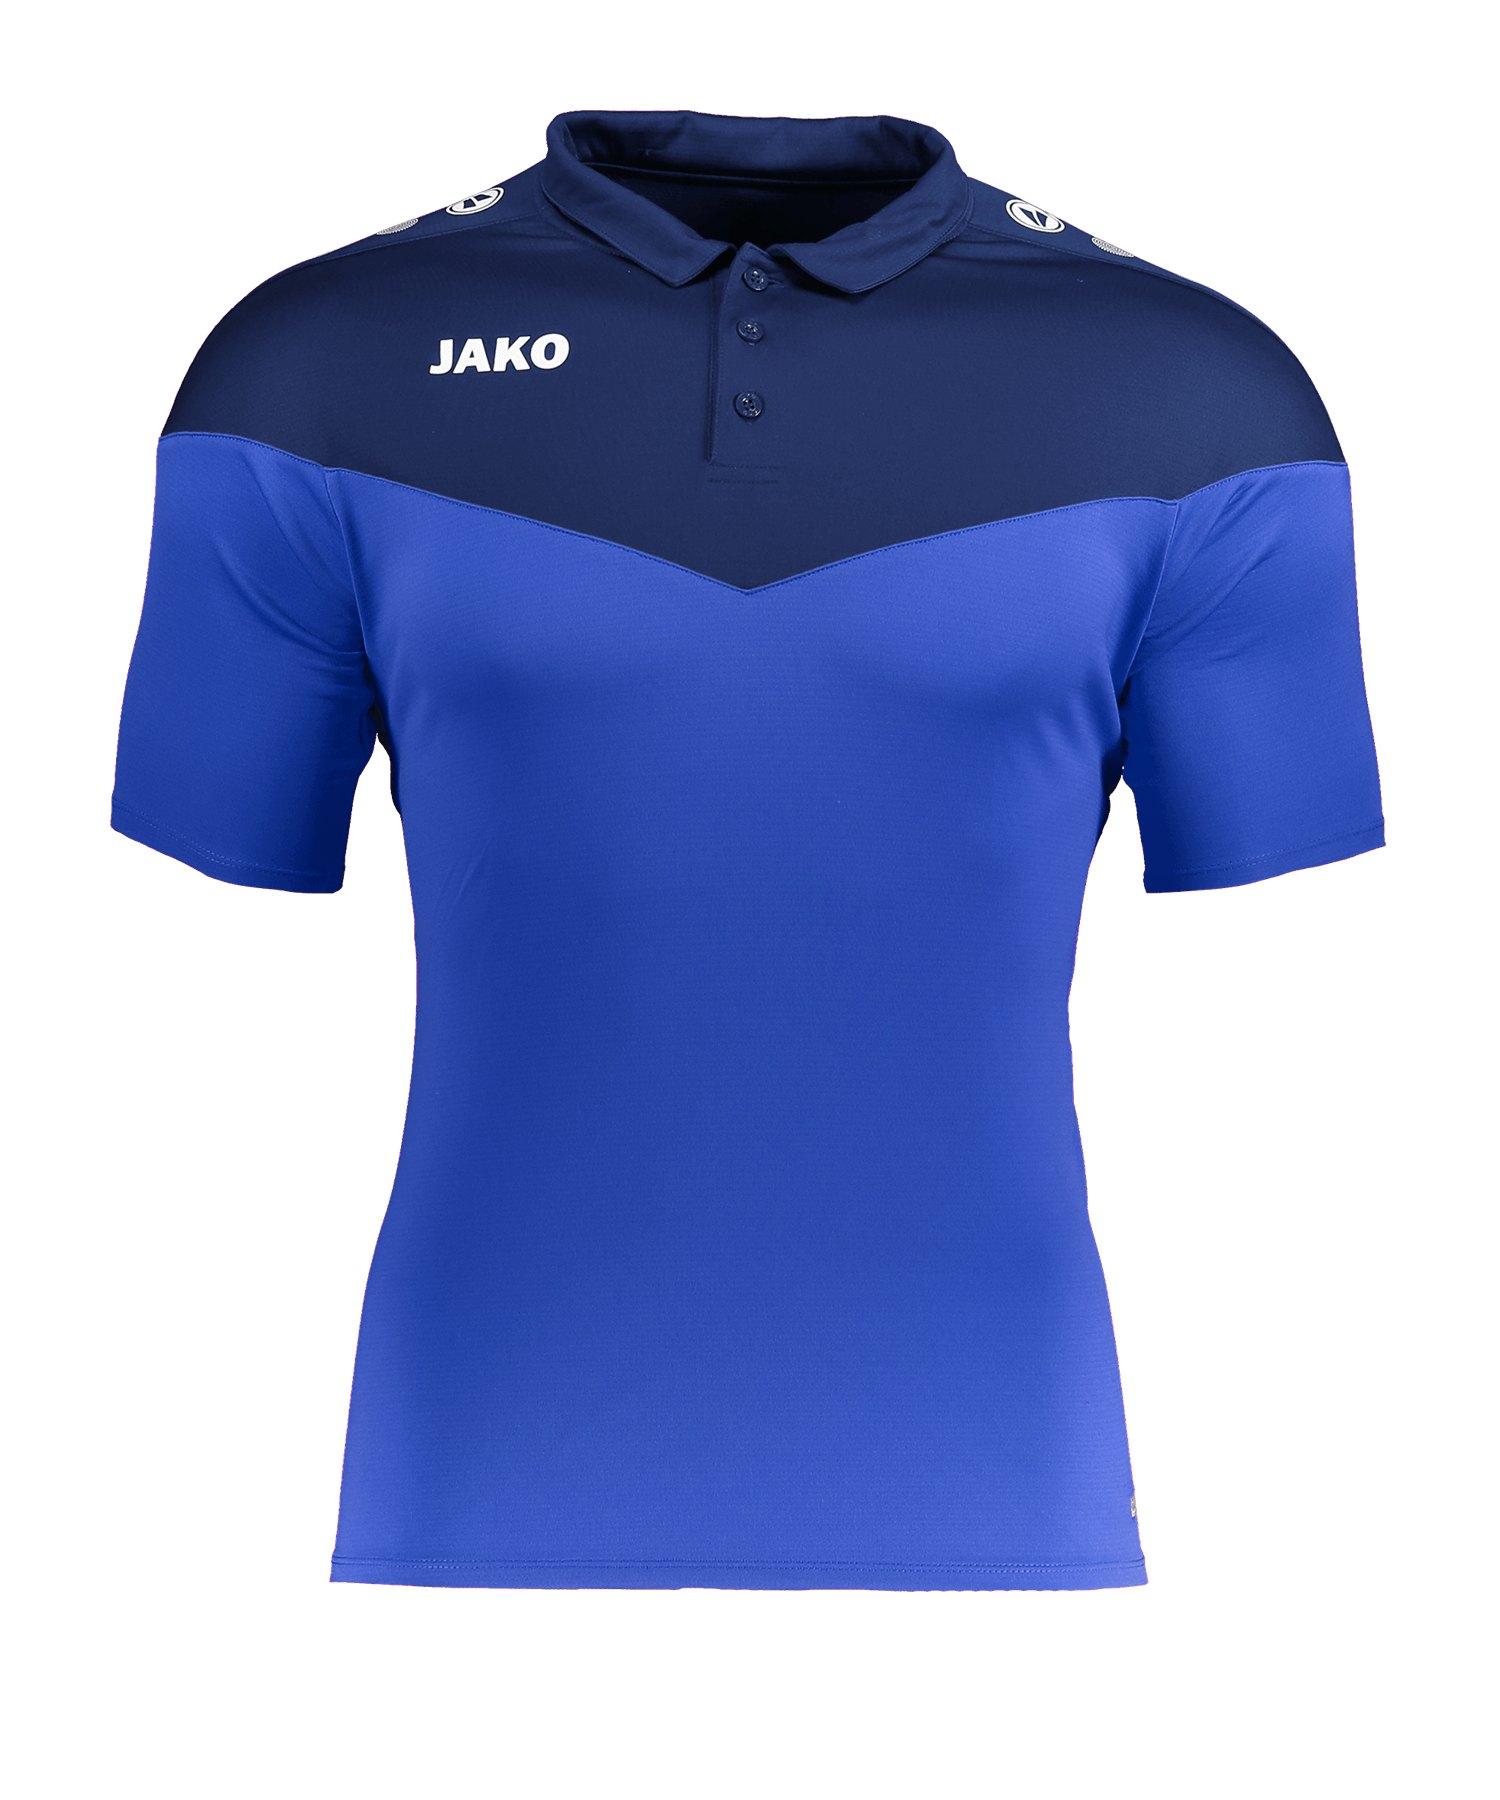 Jako Champ 2.0 Poloshirt Blau F49 - blau